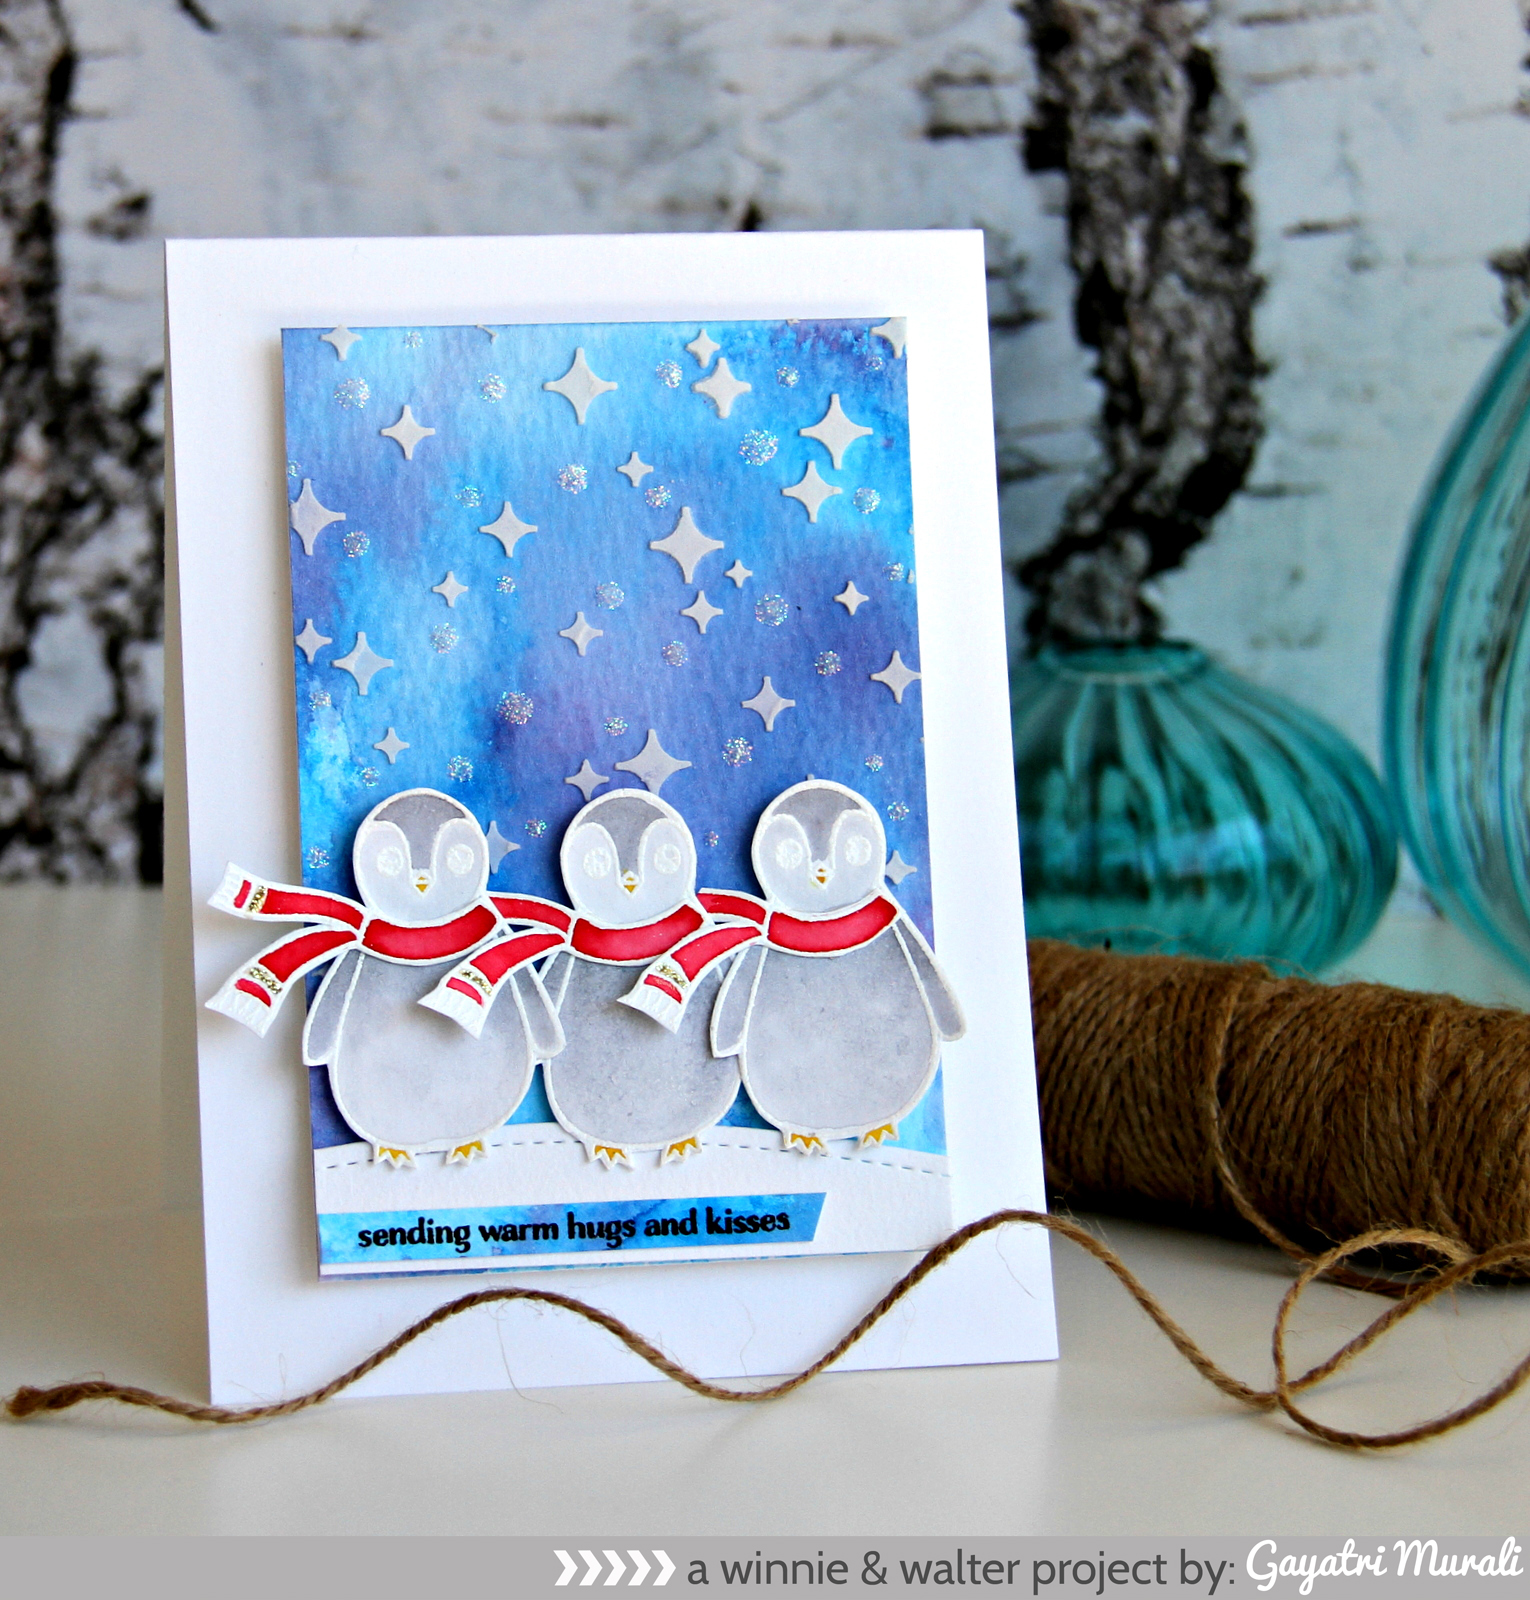 gayatri_Penguin card